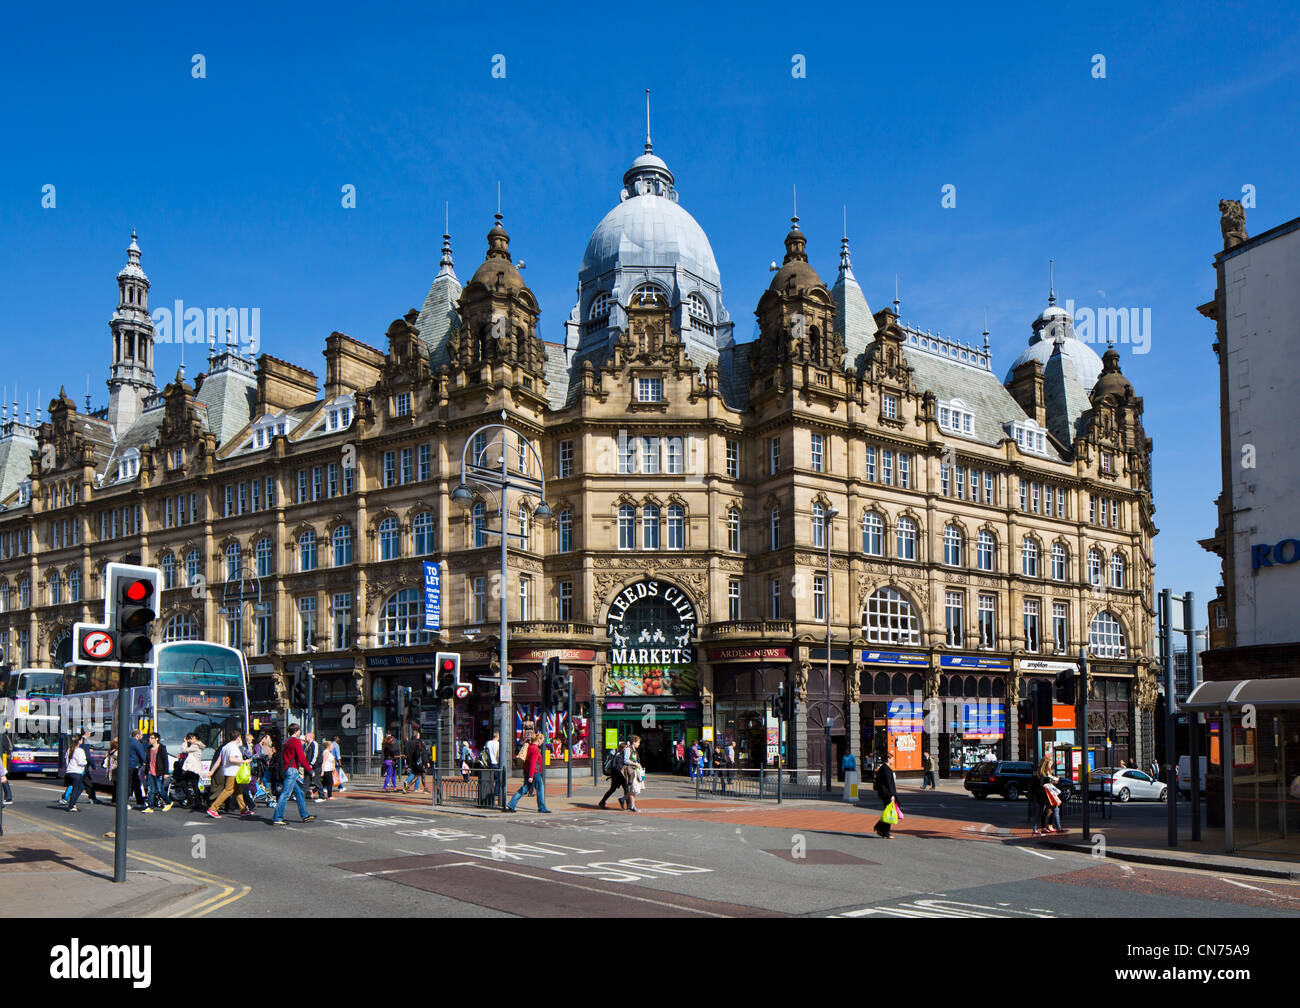 Exterior of the Edwardian Leeds City Markets (Kirkgate Market), Leeds, West Yorkshire, England - Stock Image